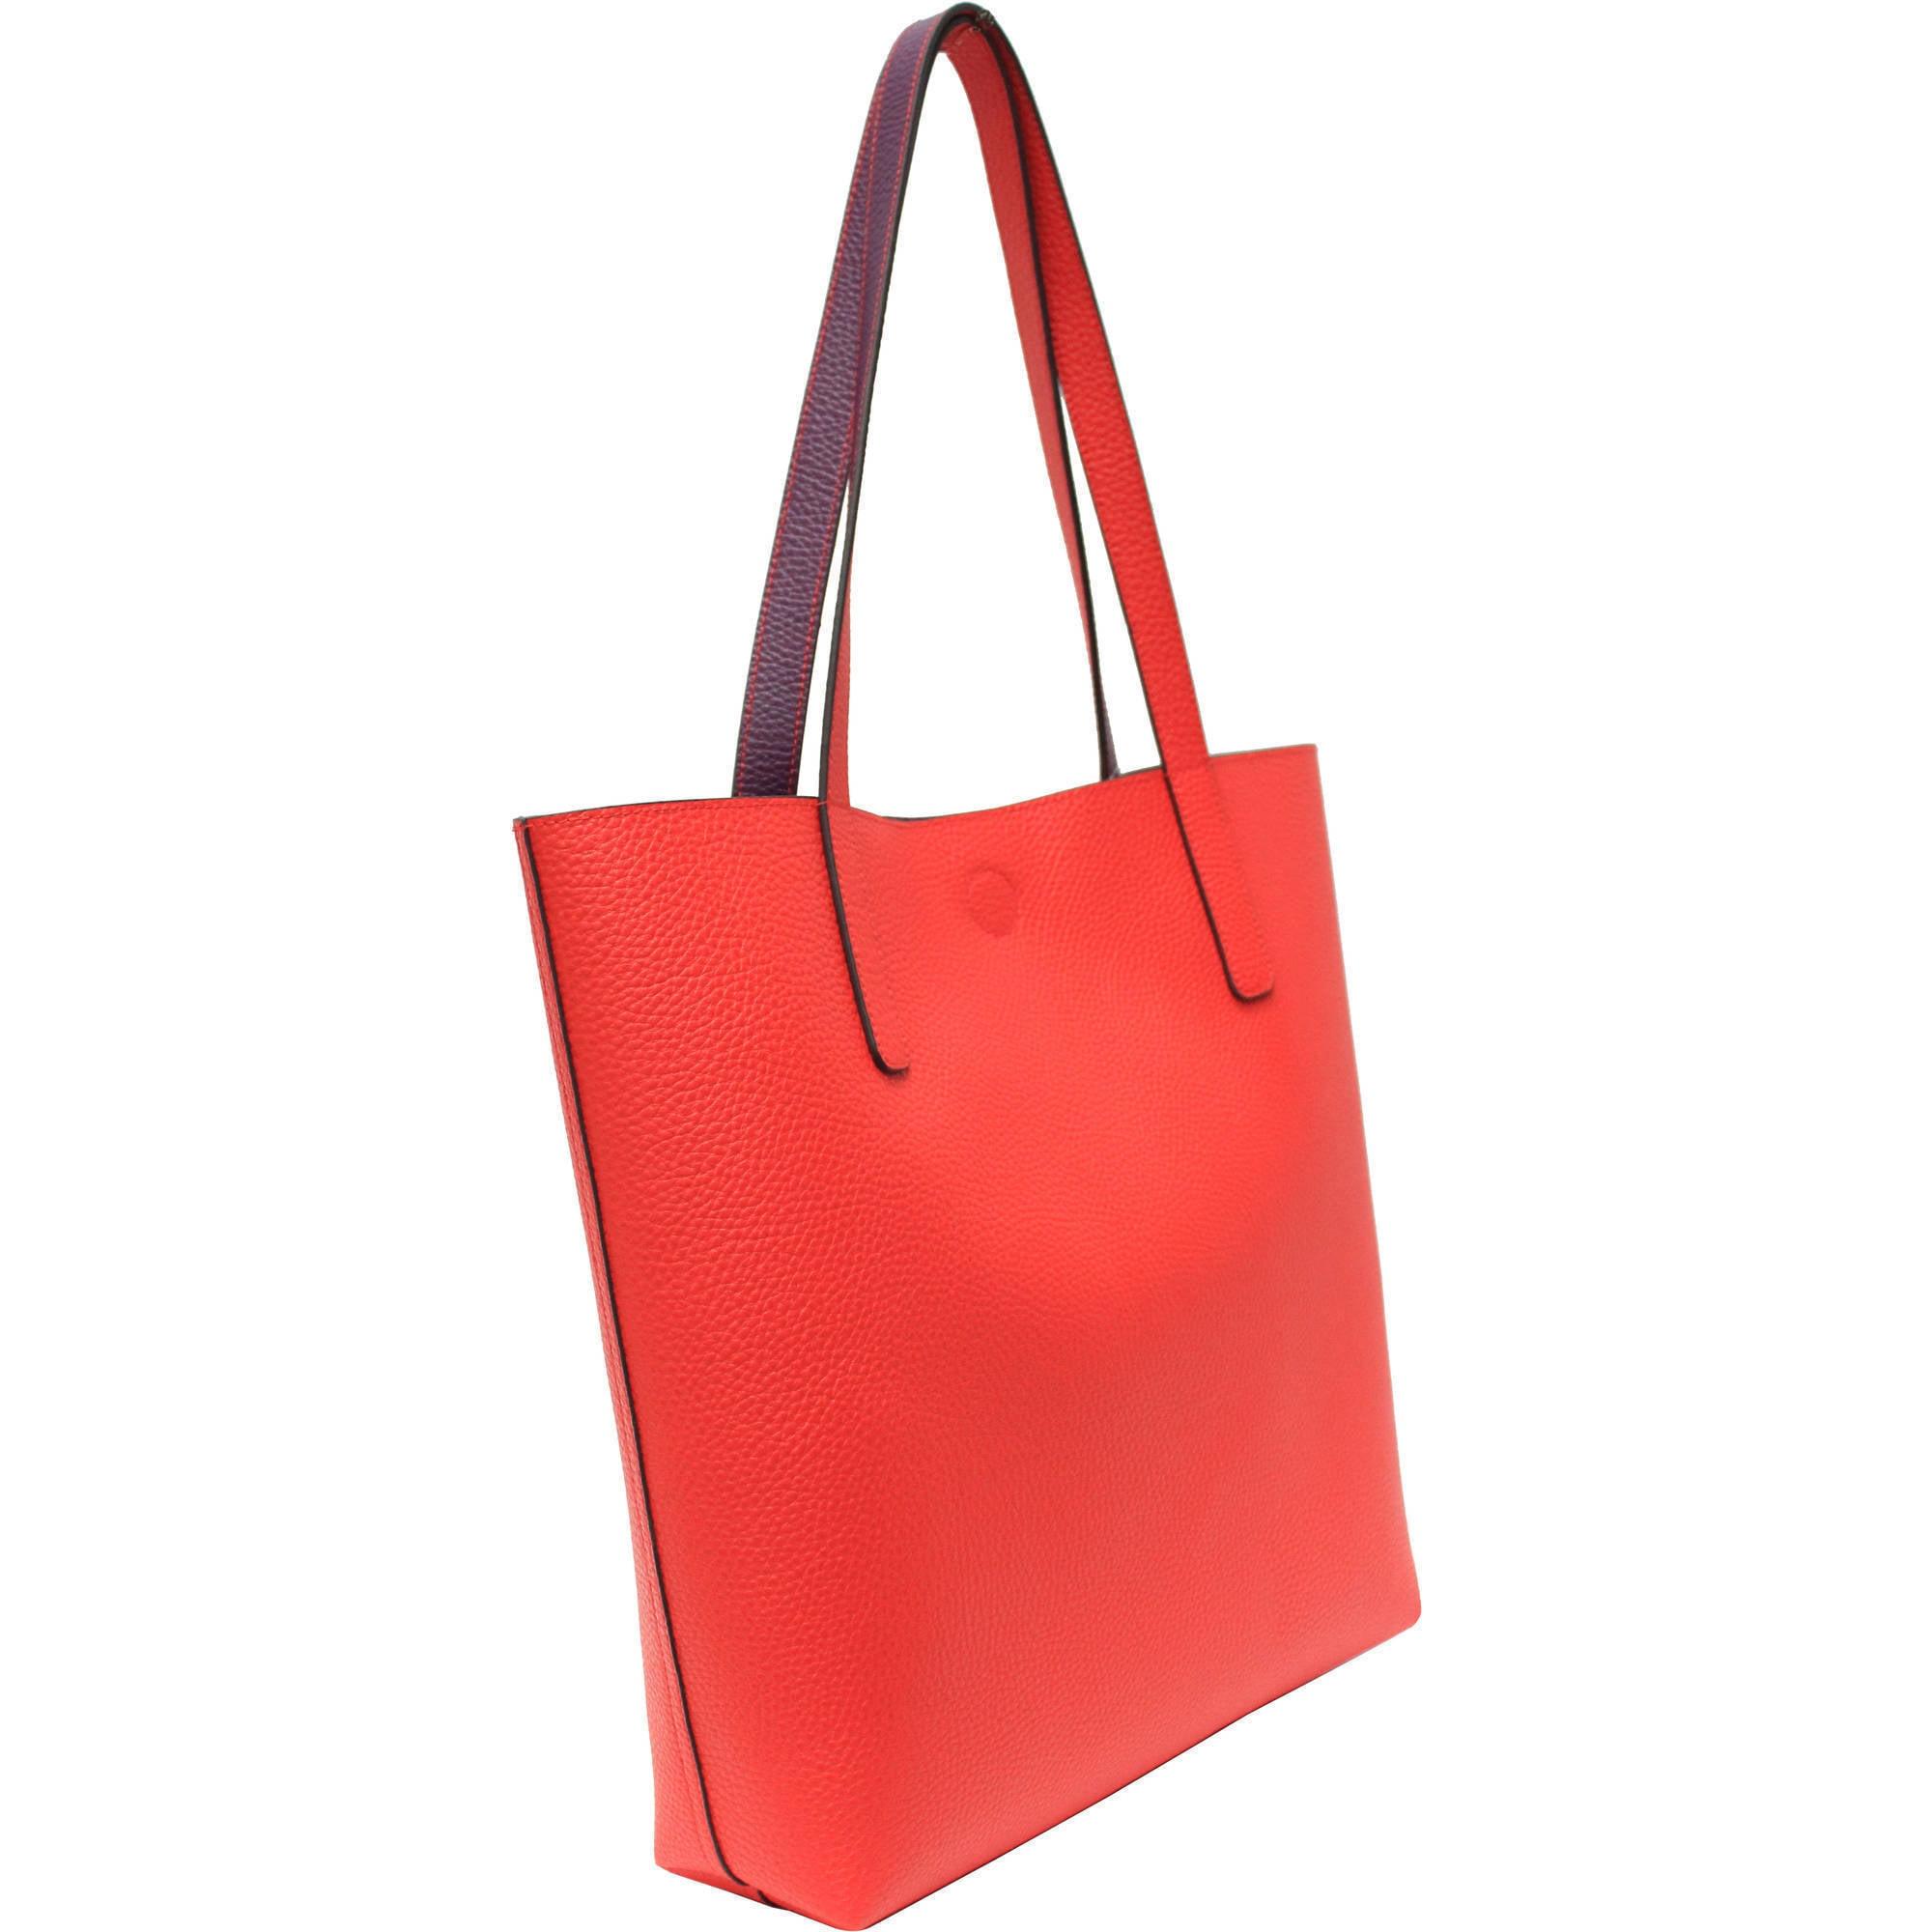 George Women's Reagan Reversible Classic Tote Handbag - Walmart.com